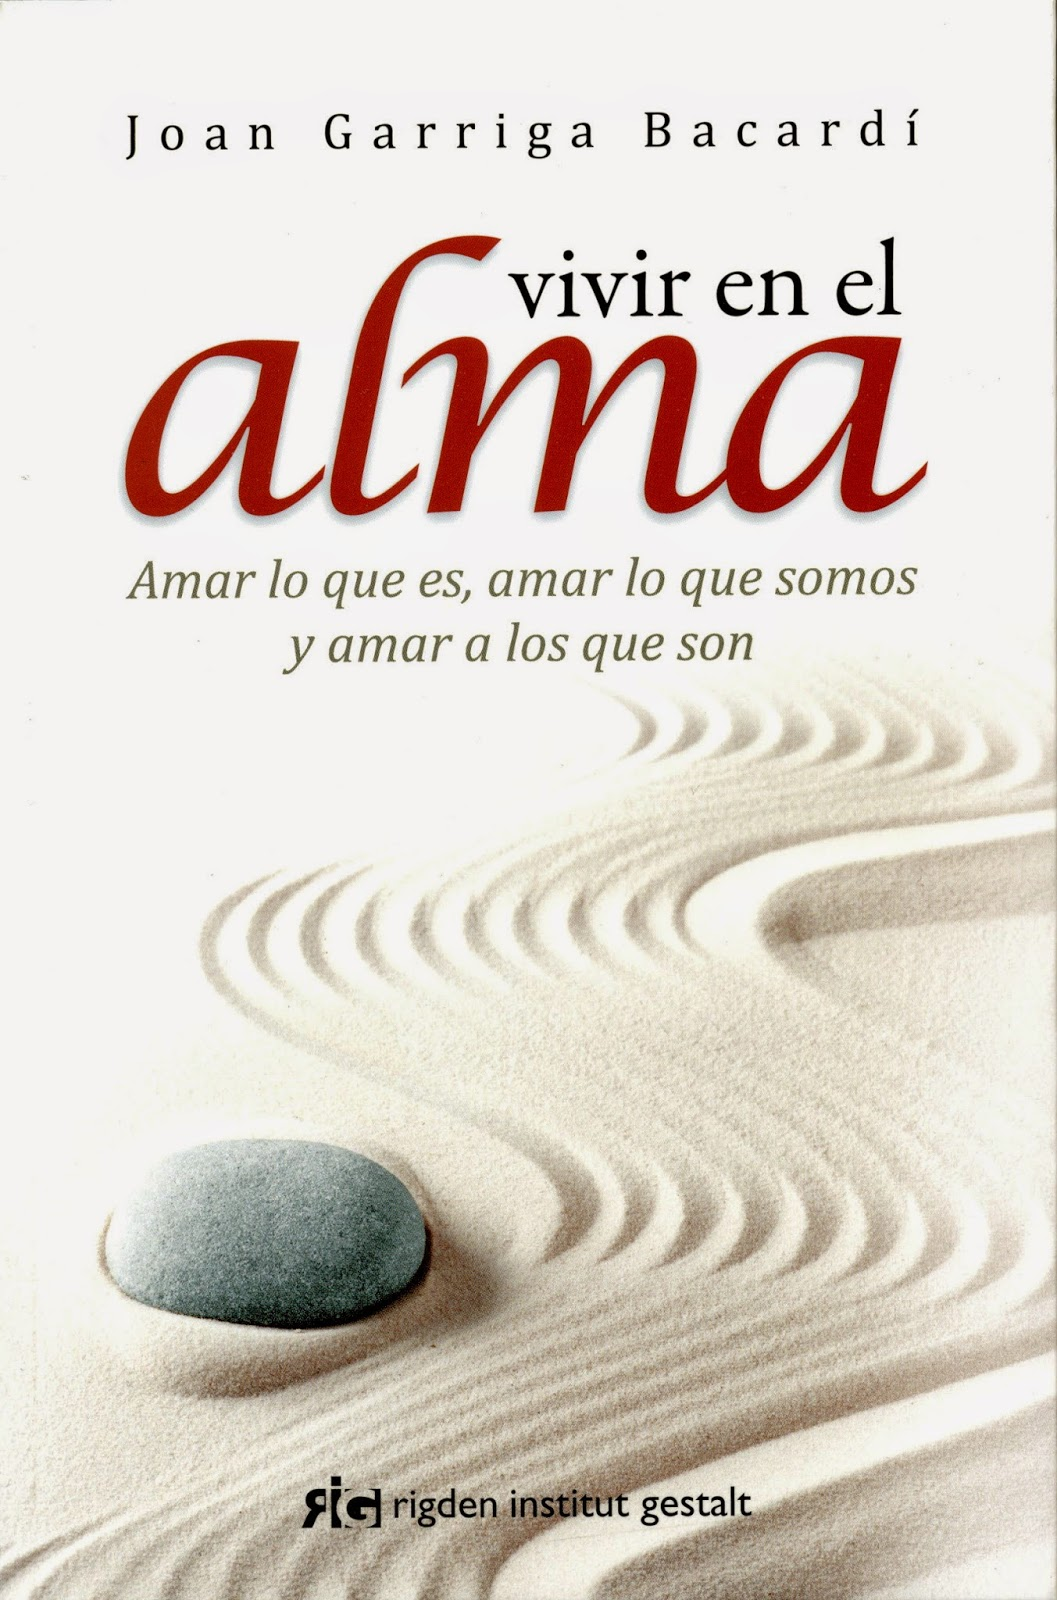 VIVIR EN EL ALMA Joan Garriga Bacardí